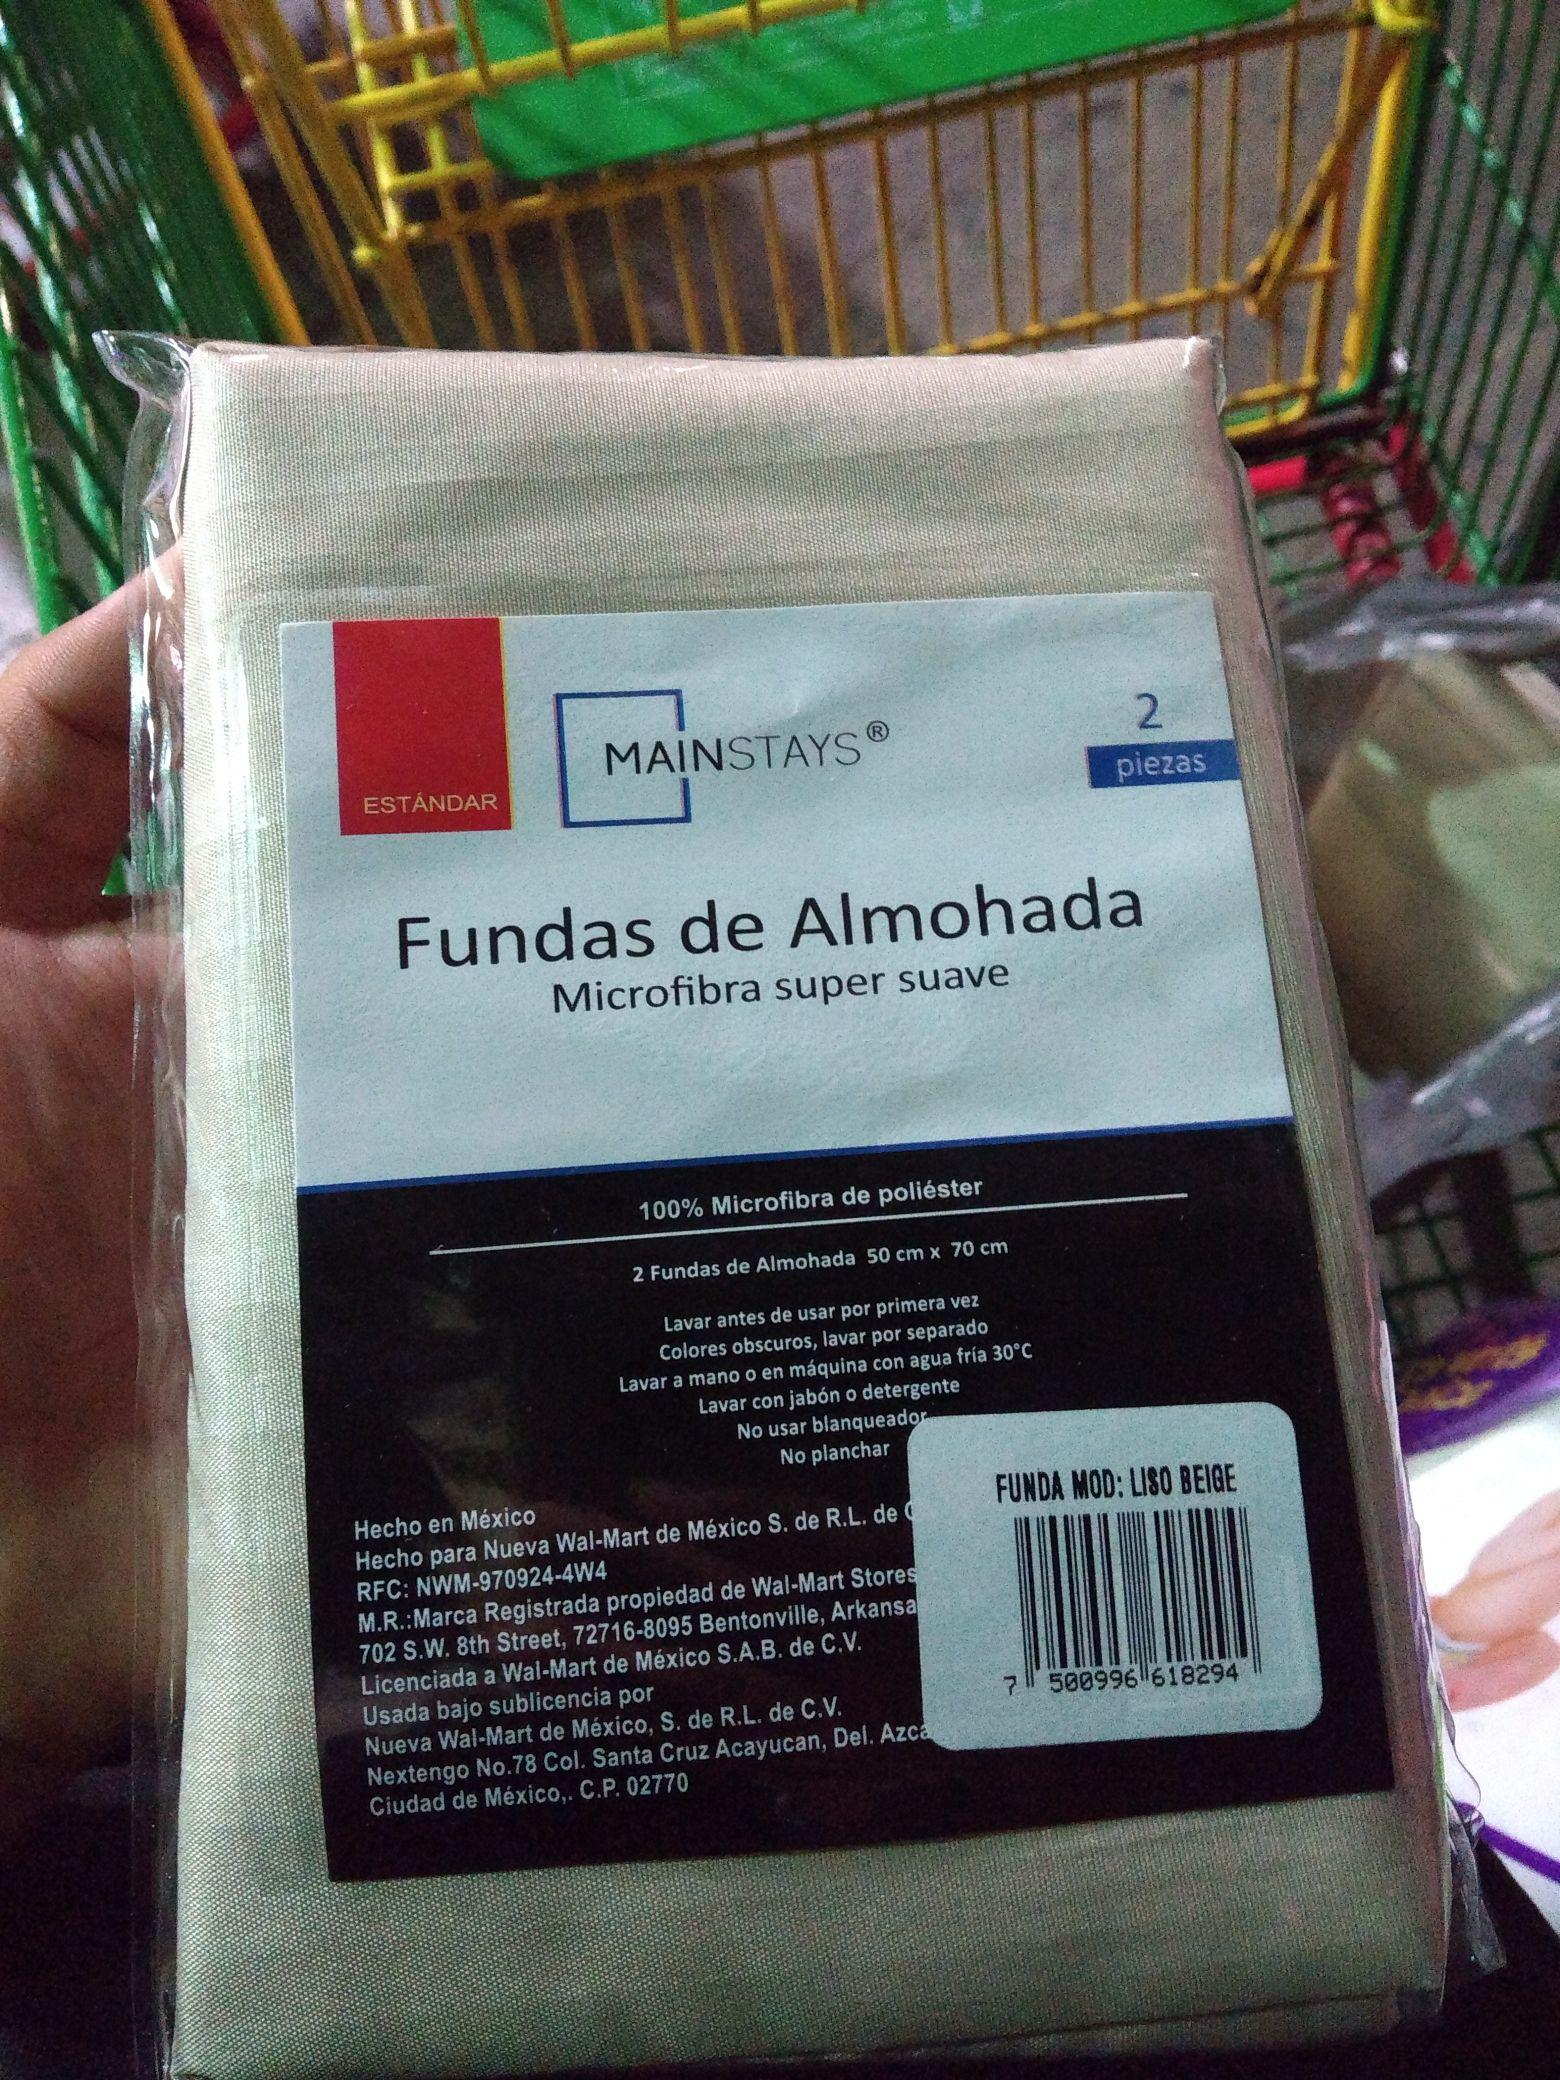 Bodega Aurrera: Funda de almohada Mainstays